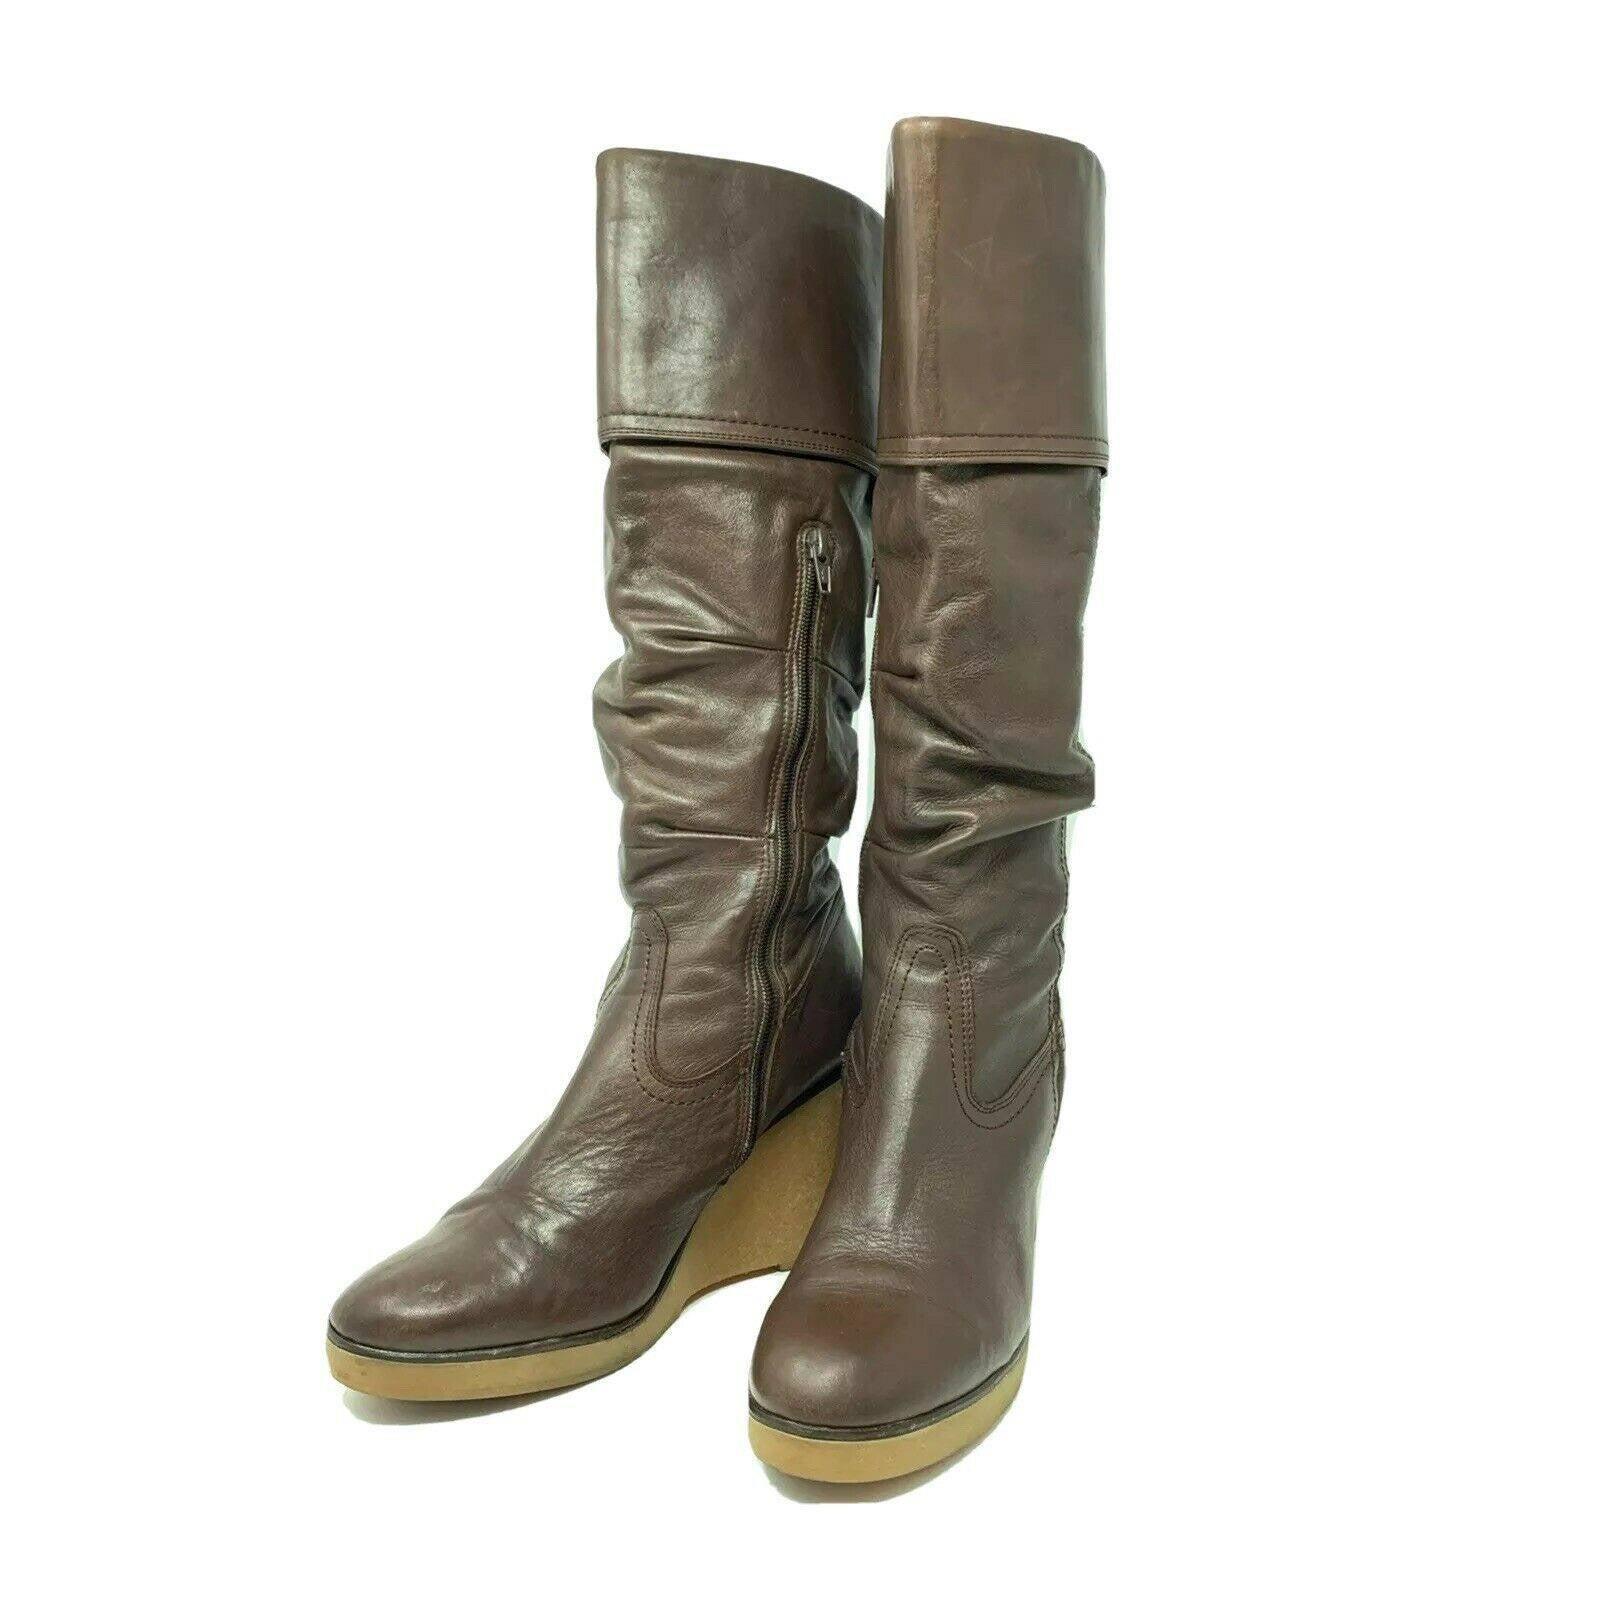 BRONX Wedge Boots Knee High Women 10.5